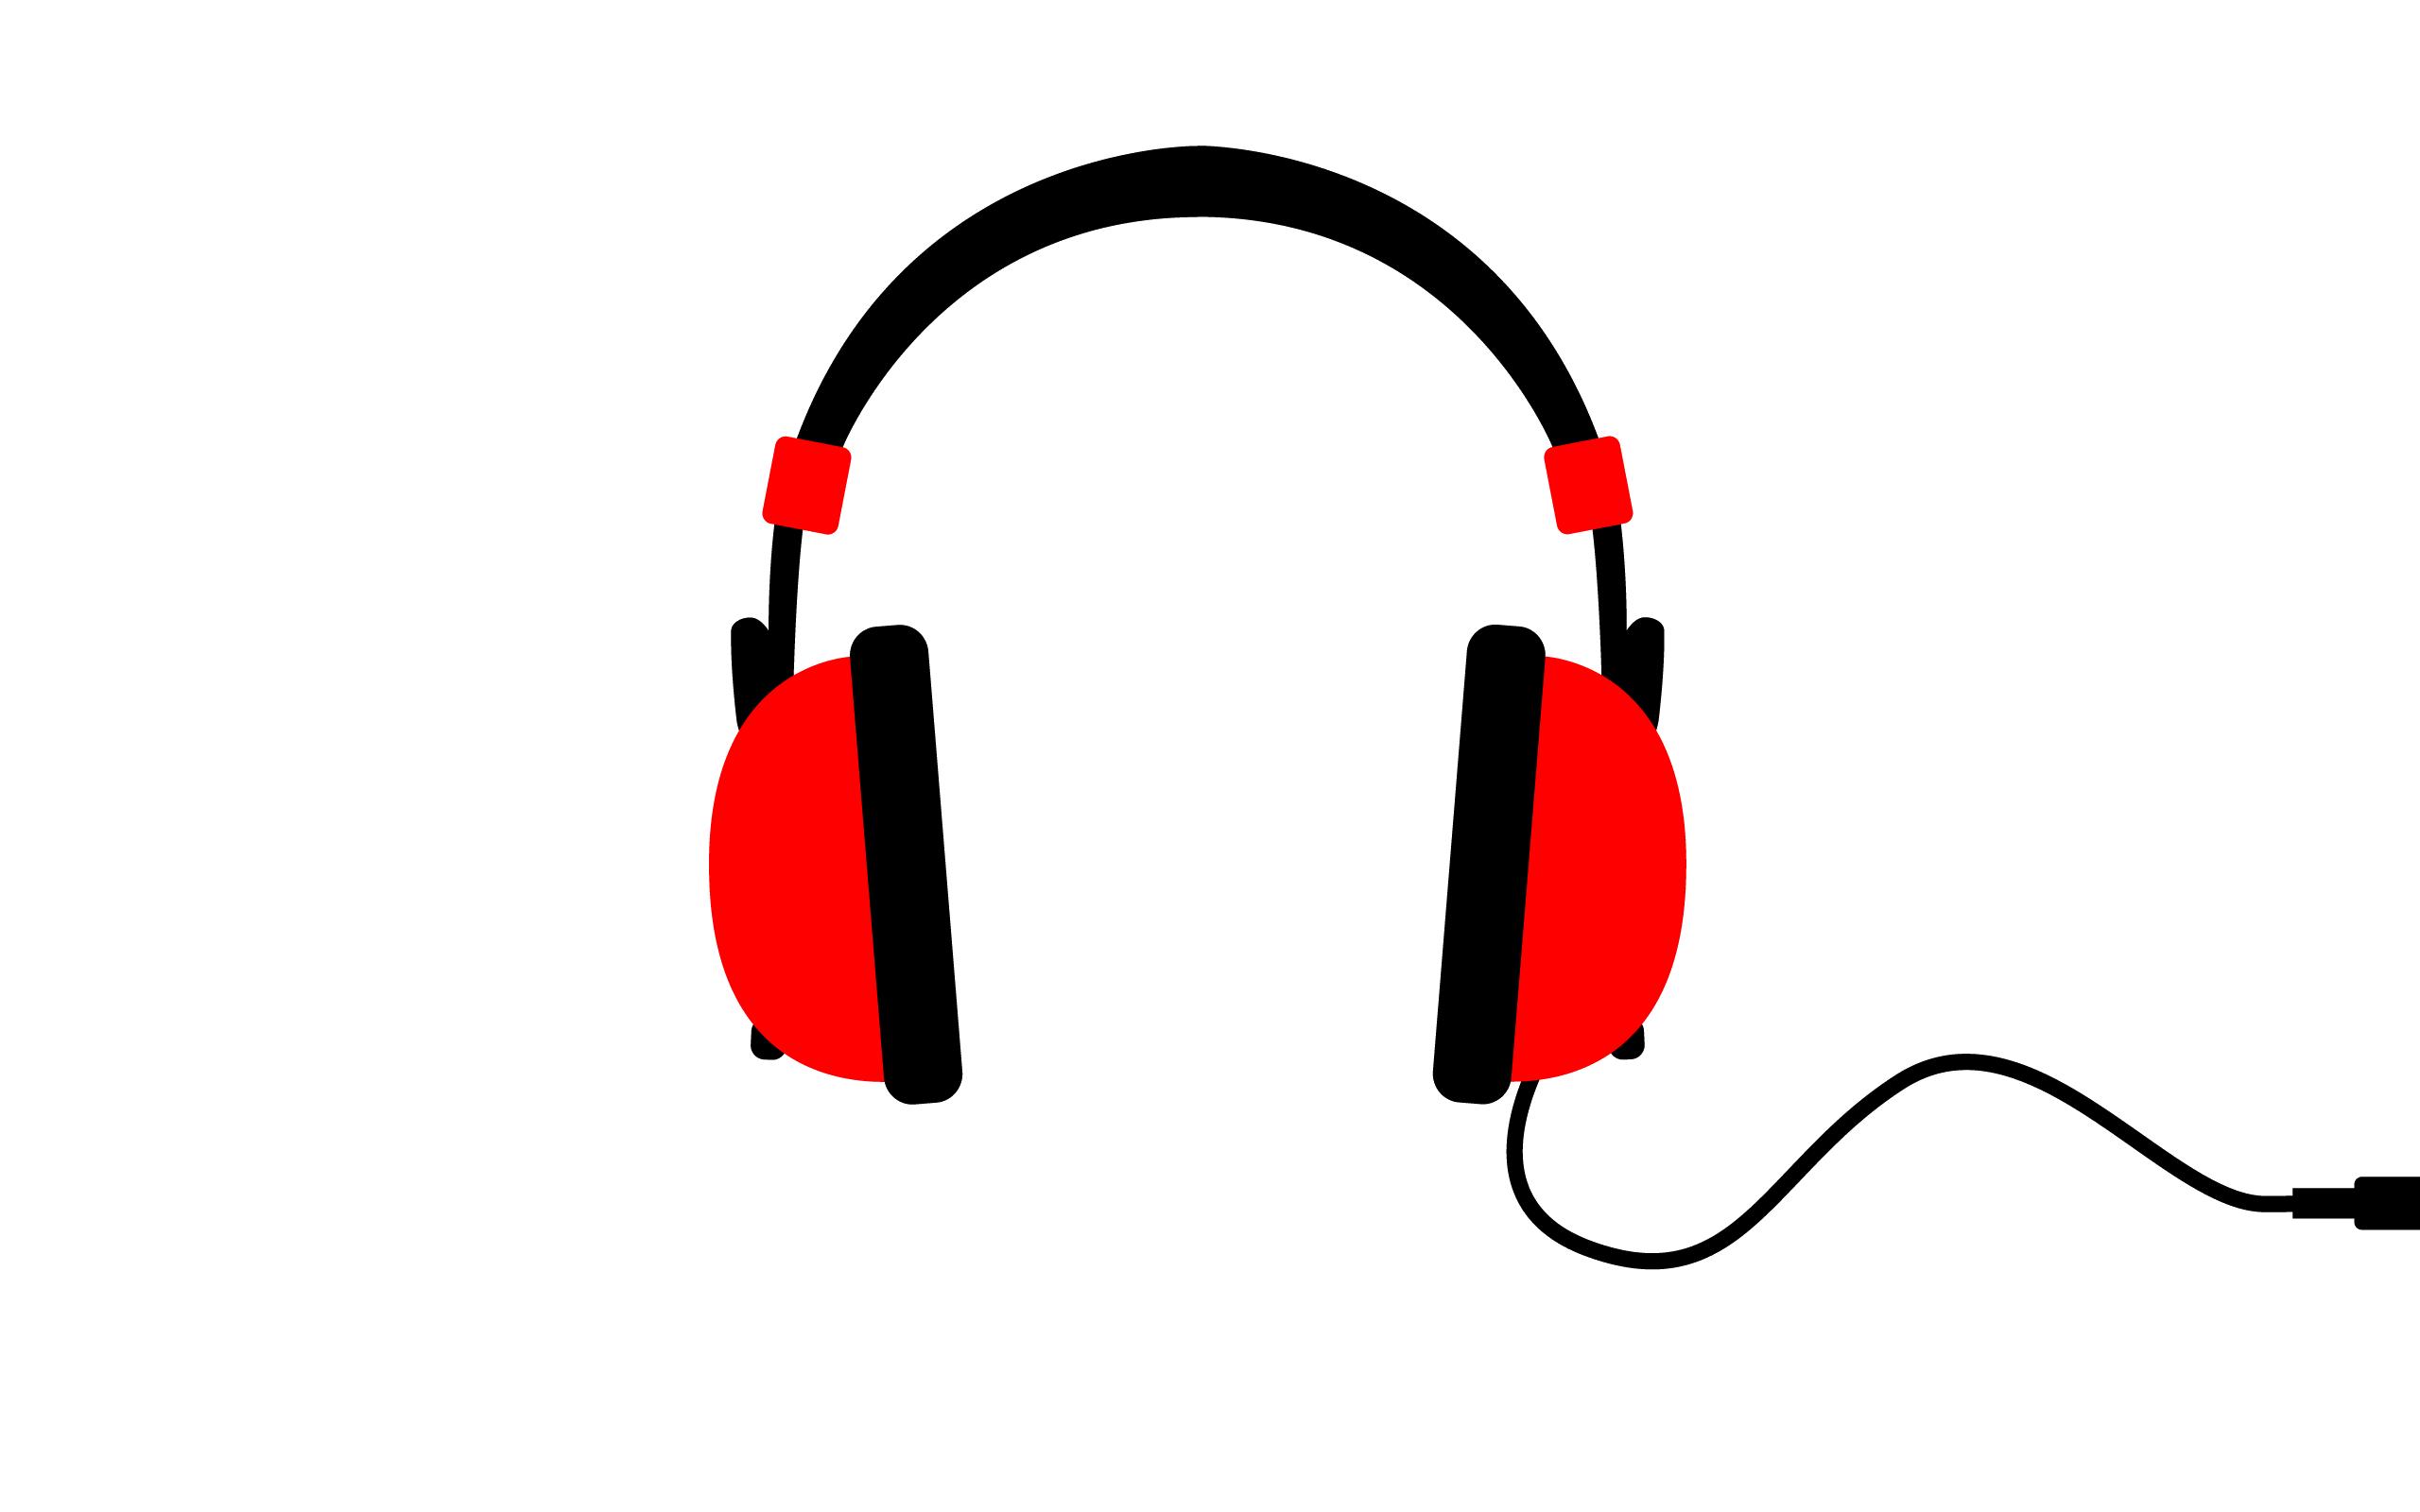 Headphones Png Clipart - Headphones, Transparent background PNG HD thumbnail